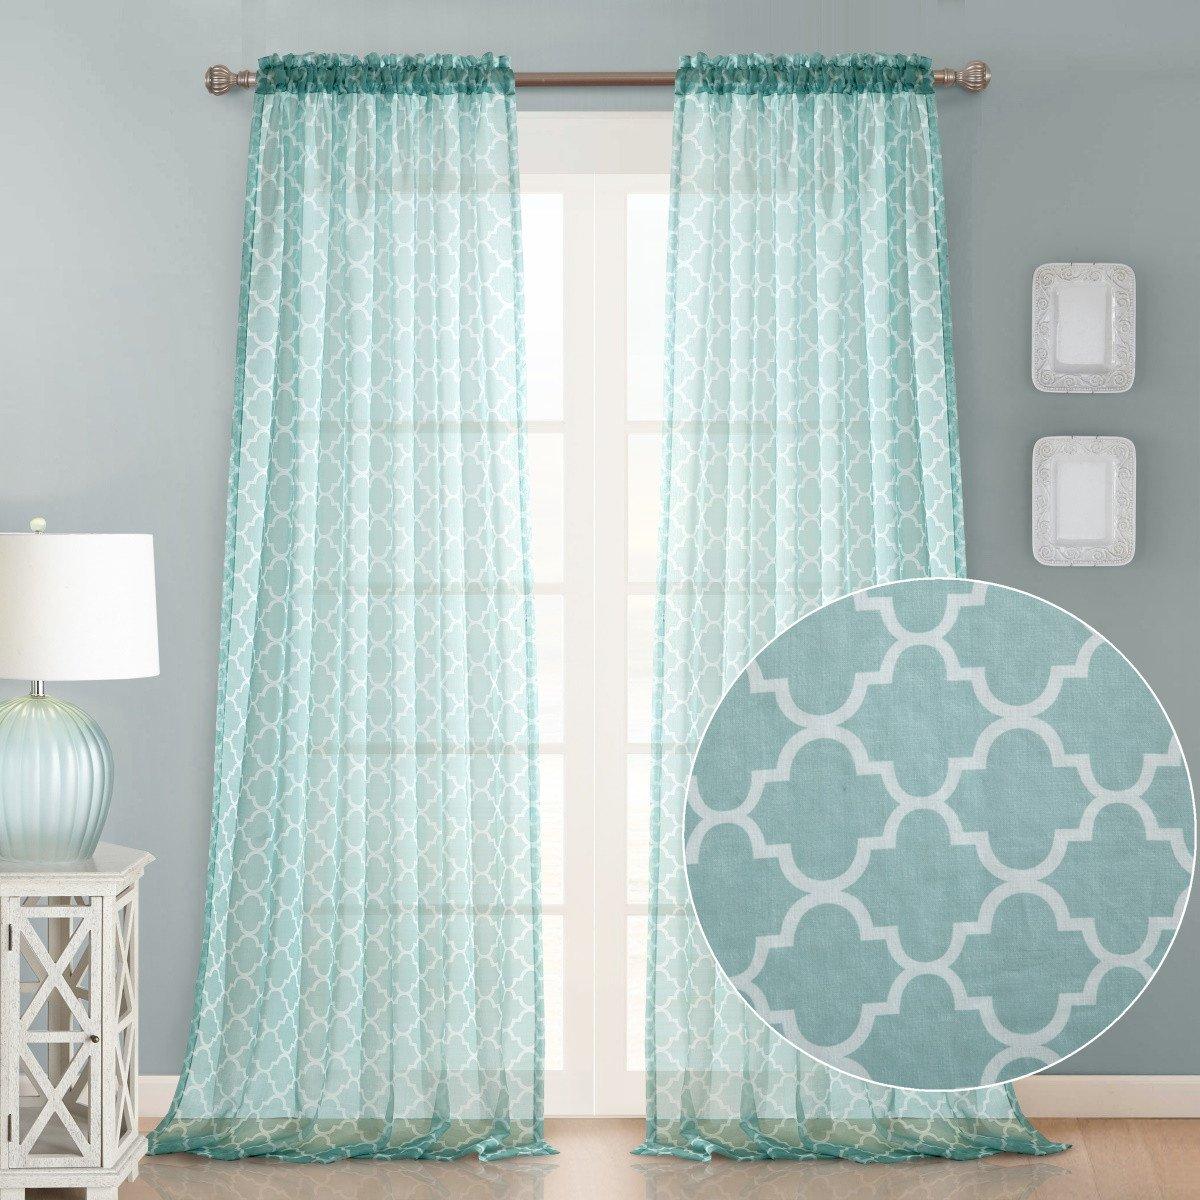 Dreaming Casa Decorative Sheer Curtain Panels for Bedroom, Living Room, Nursery, RV Windows 84Inches Long Semi Voile Drapes Rod Pocket Trellis 2 Panels (Tiffany Blue, 100'' Wx 84'' L)